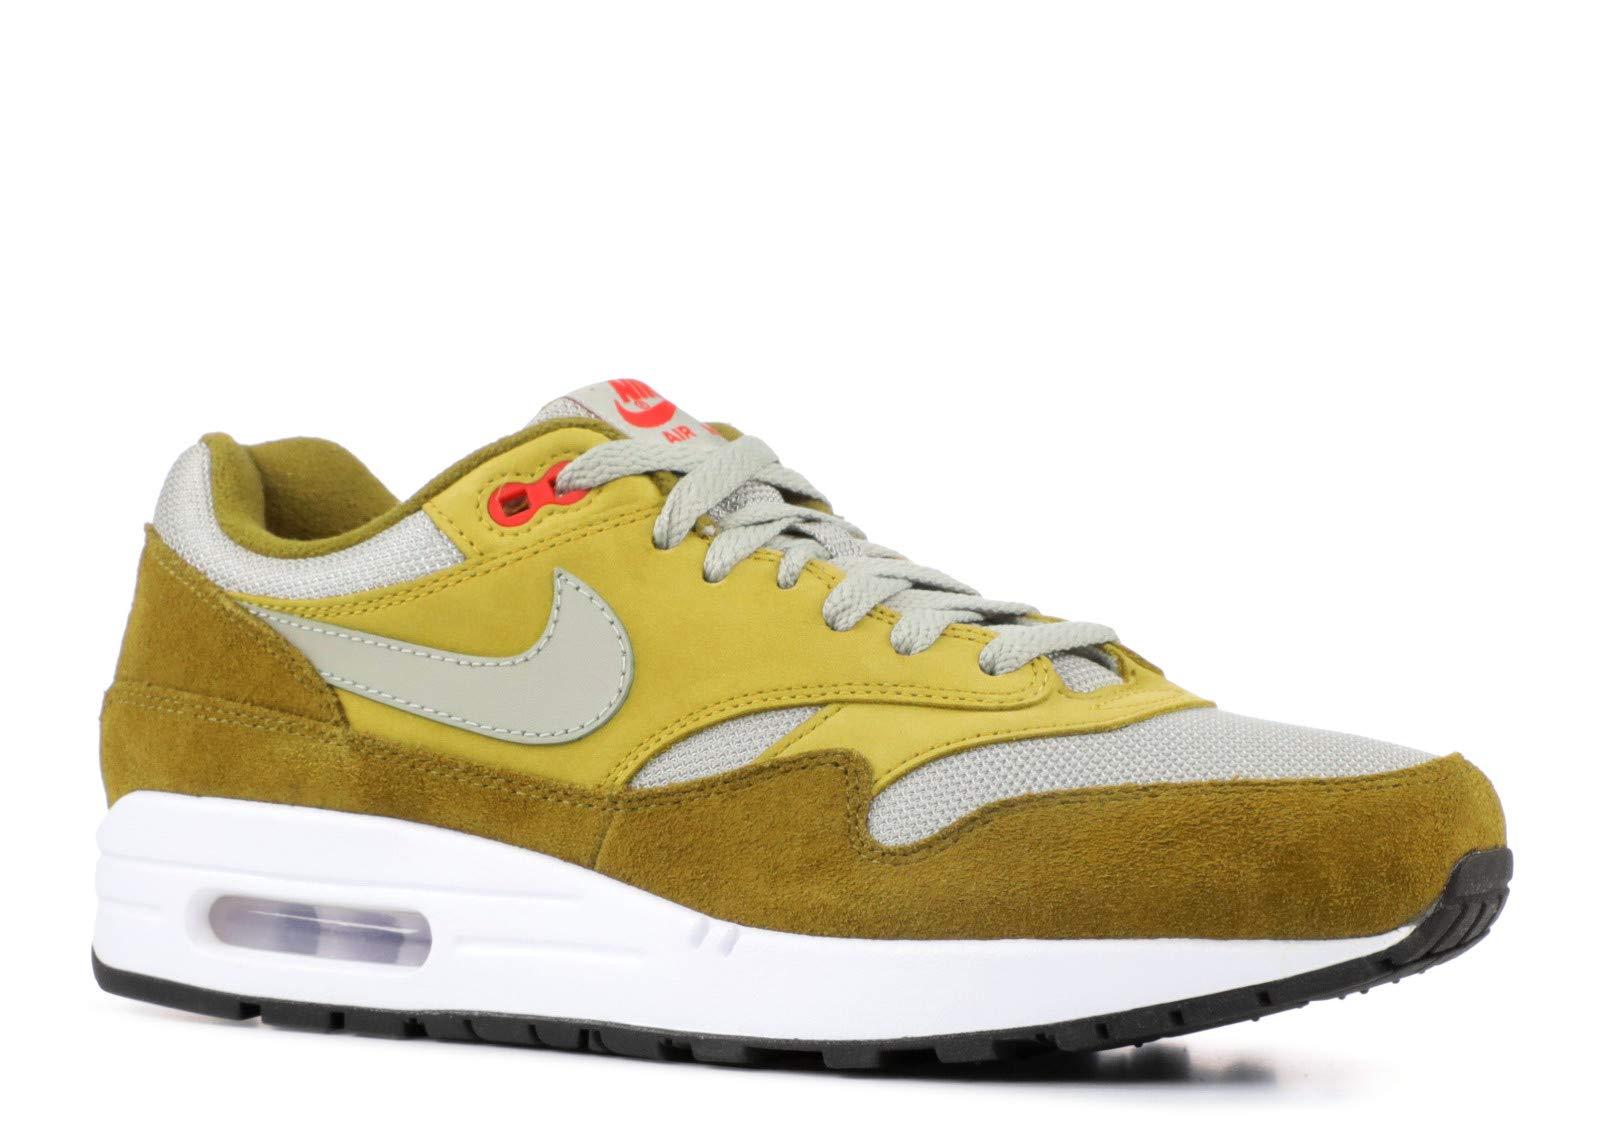 best website 20f65 ebe93 NIKE Air Max 1 Premium Retro Men's Shoes Olive Flak/Spruce Fog 908366-300  (11.5 D(M) US)